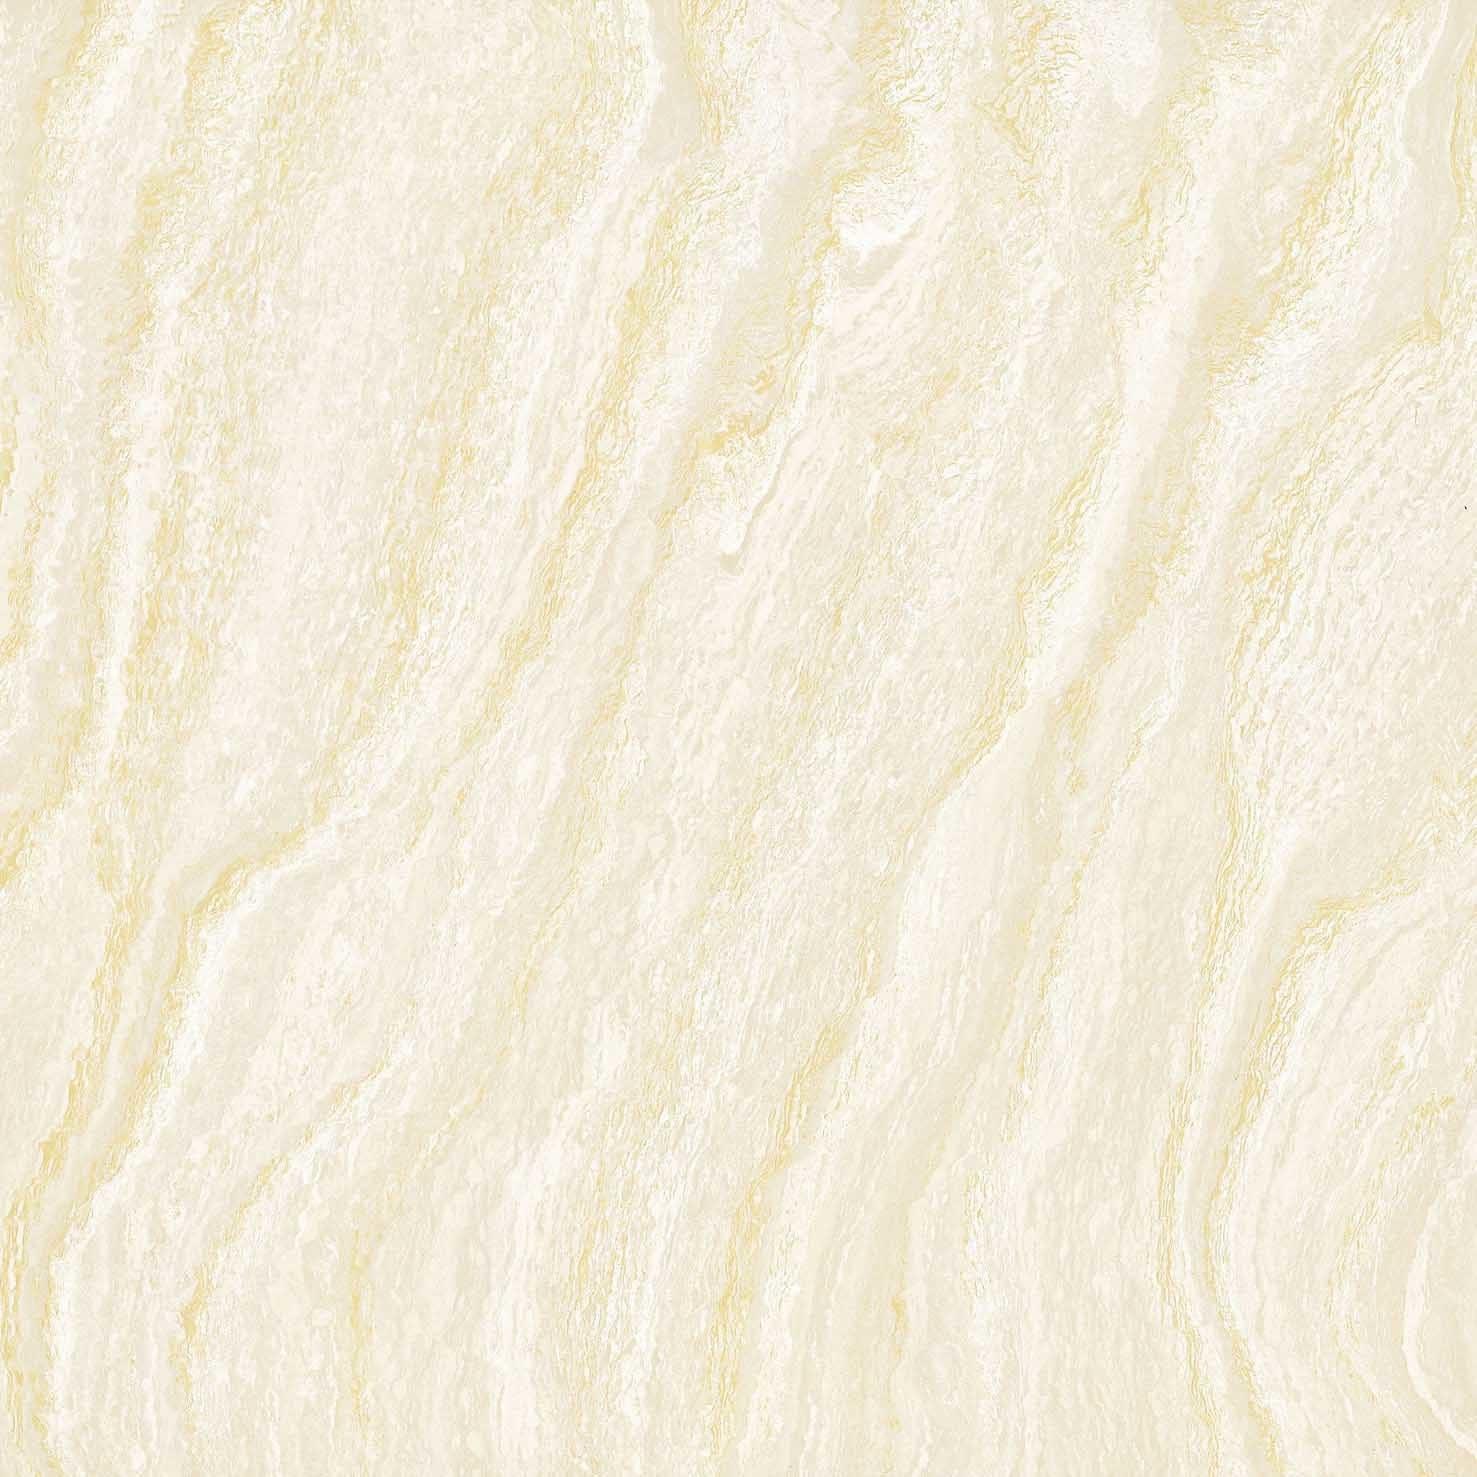 China building material amazon polished vitrified porcelain floor building material amazon polished vitrified porcelain floor tile 600600 800800mm dailygadgetfo Choice Image